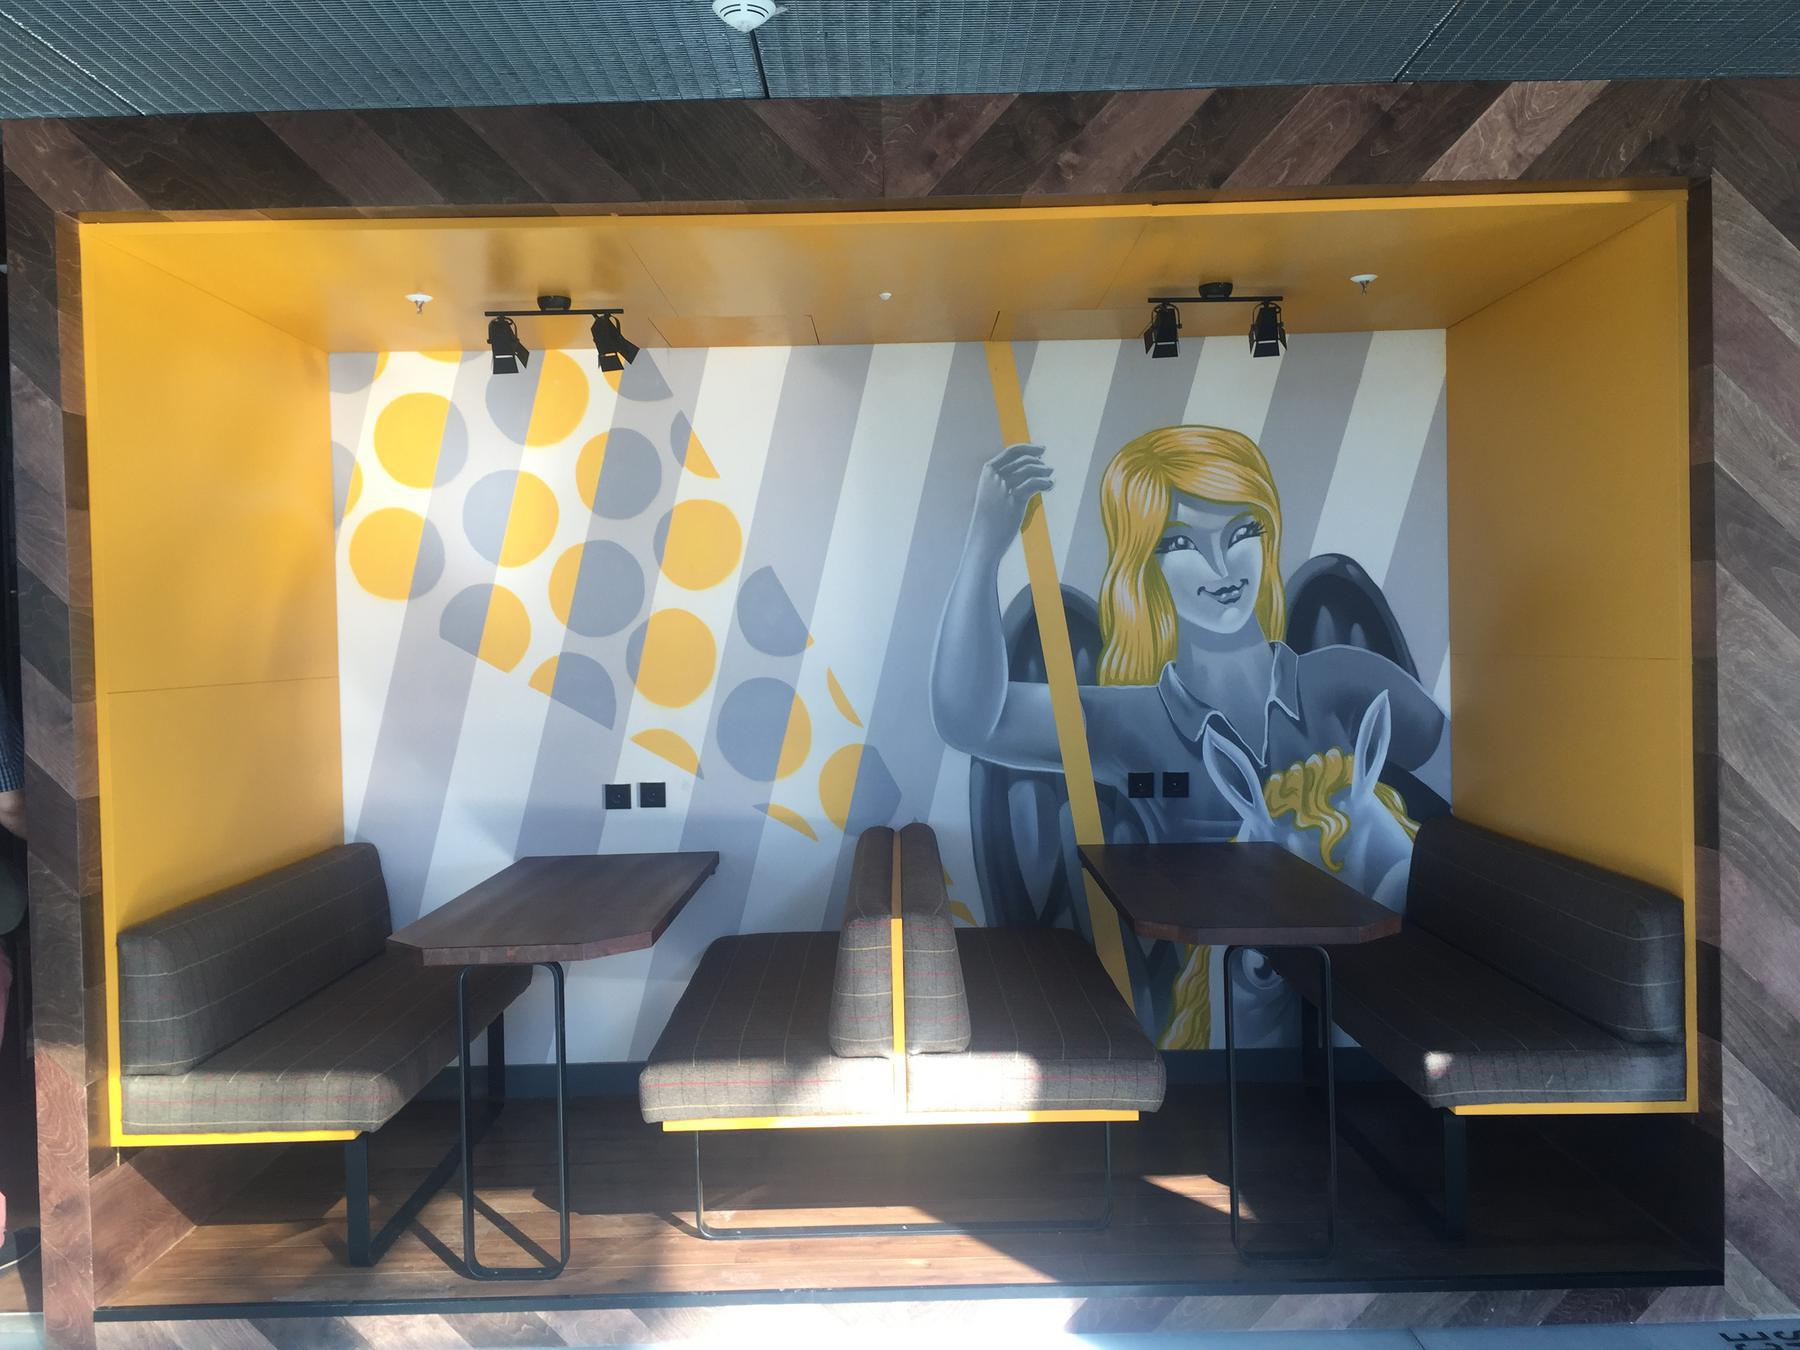 wework_open_meeting_booth2